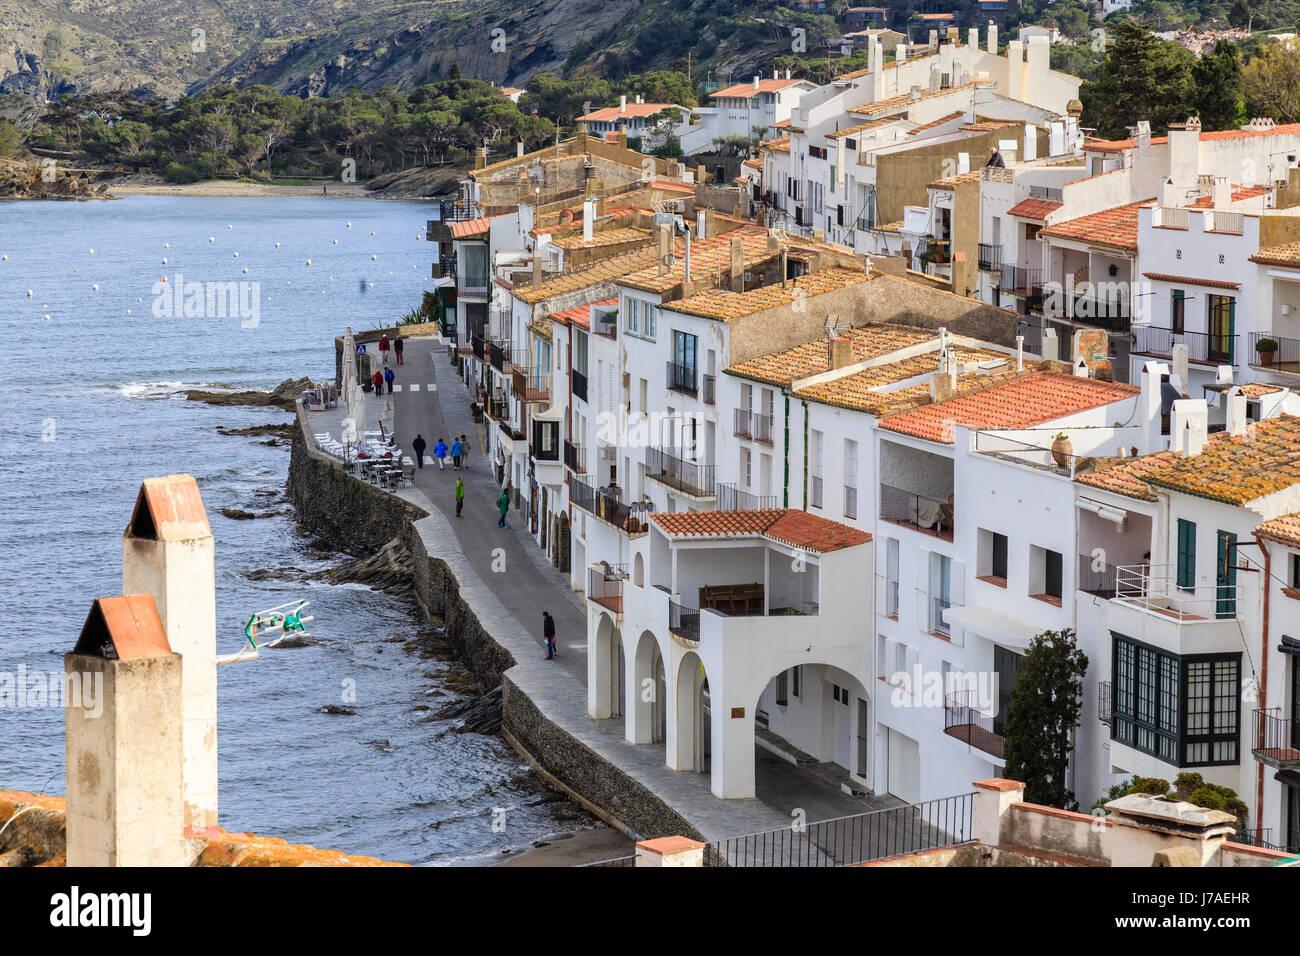 Spain, Catalonia, Costa Brava, Cadaques, D'en Pitxot street and sea side - Stock Image